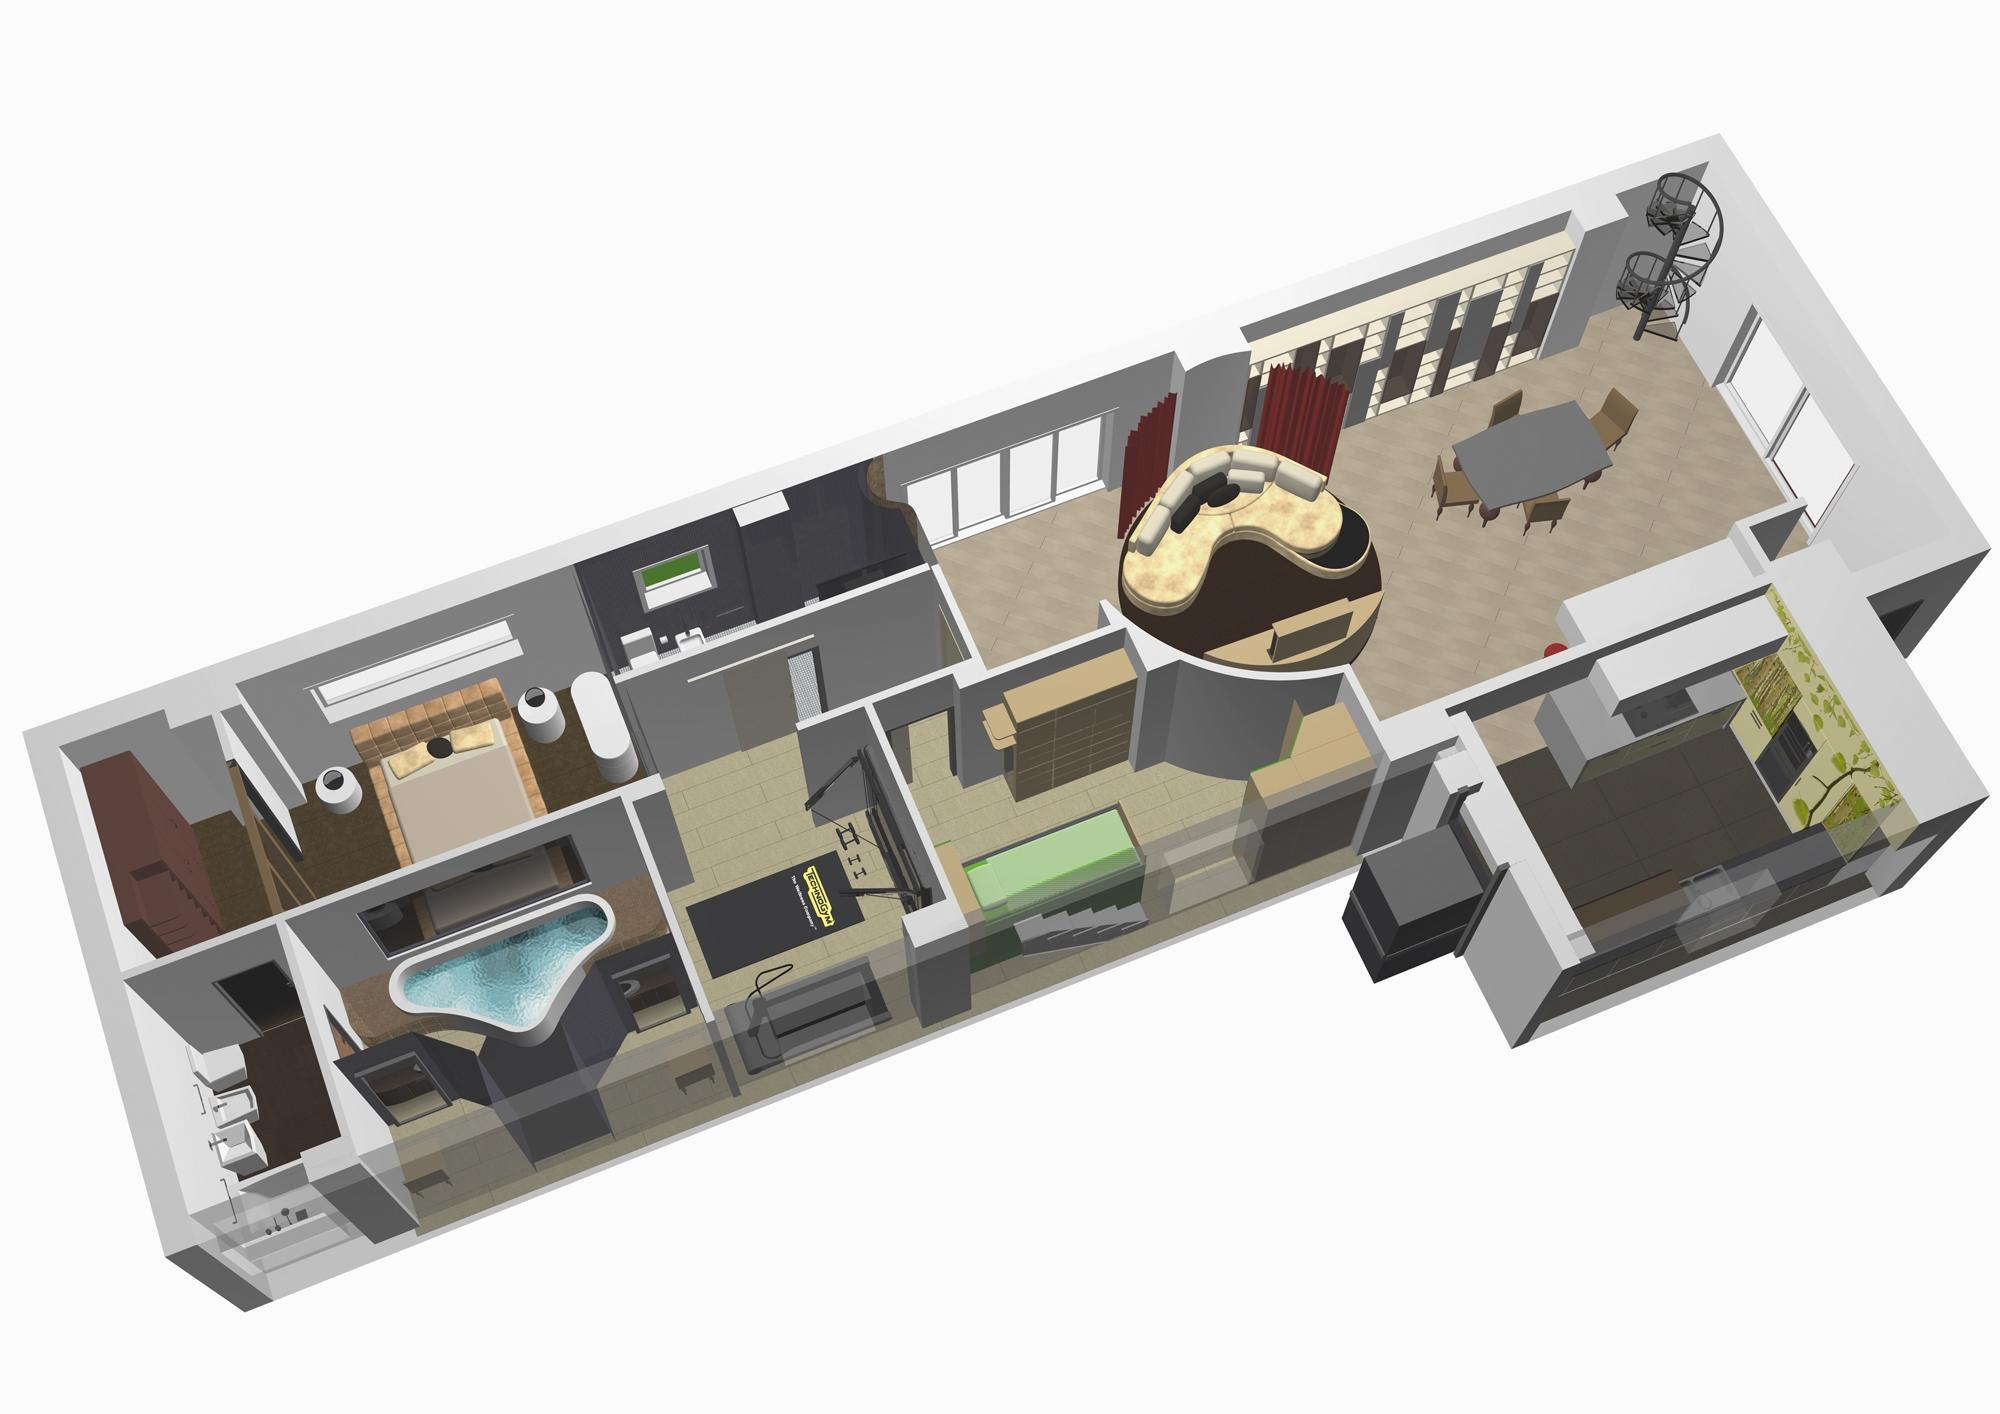 Una casa domotica missionearchitetto - Trasformare una casa in domotica ...